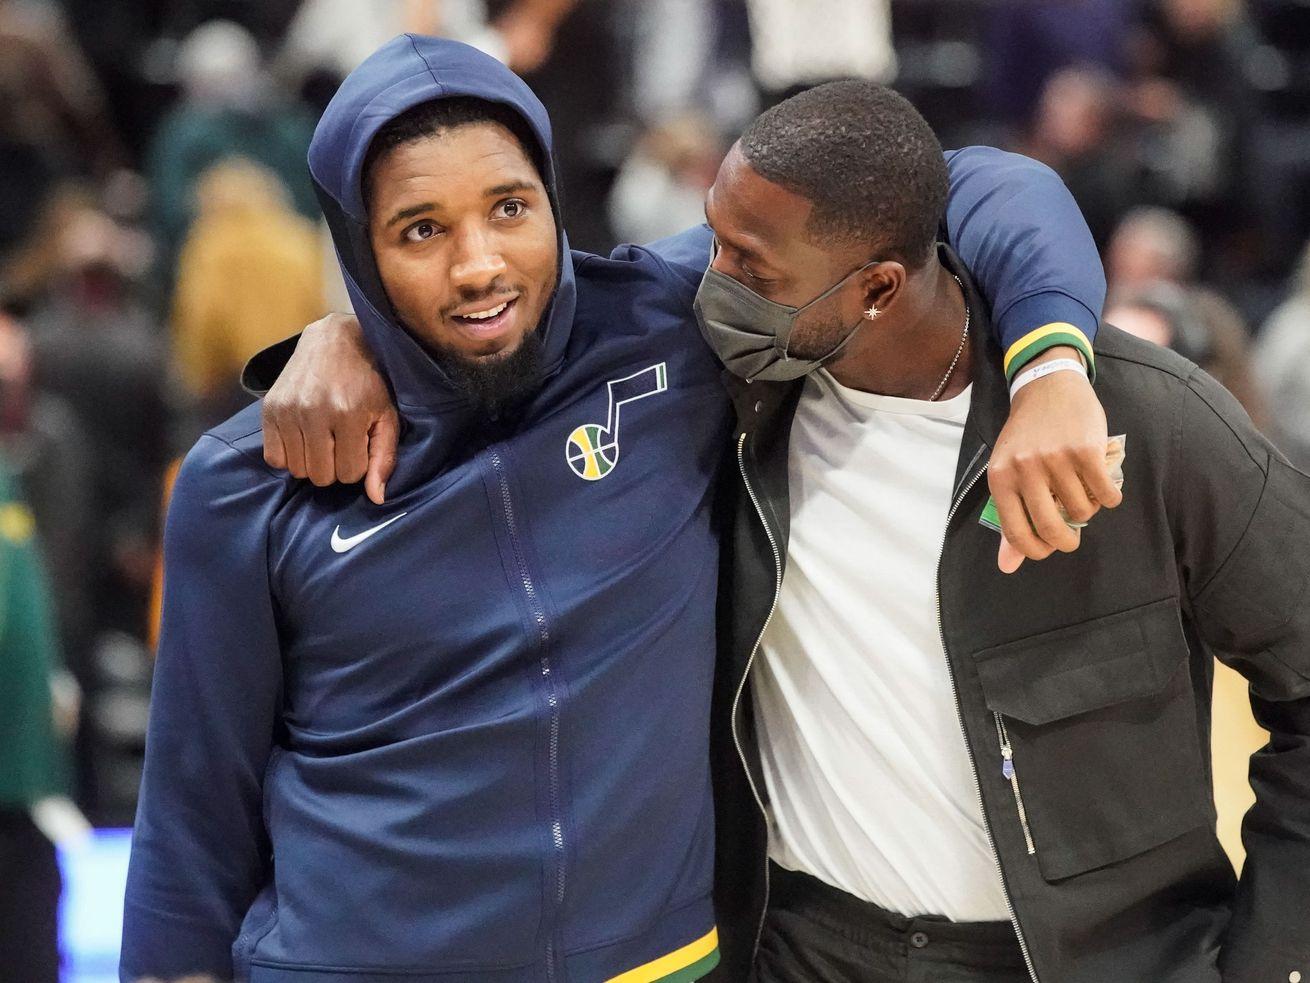 Utah Jazz guard Donovan Mitchell and Utah Jazz minority owner Dwayne Wade talk